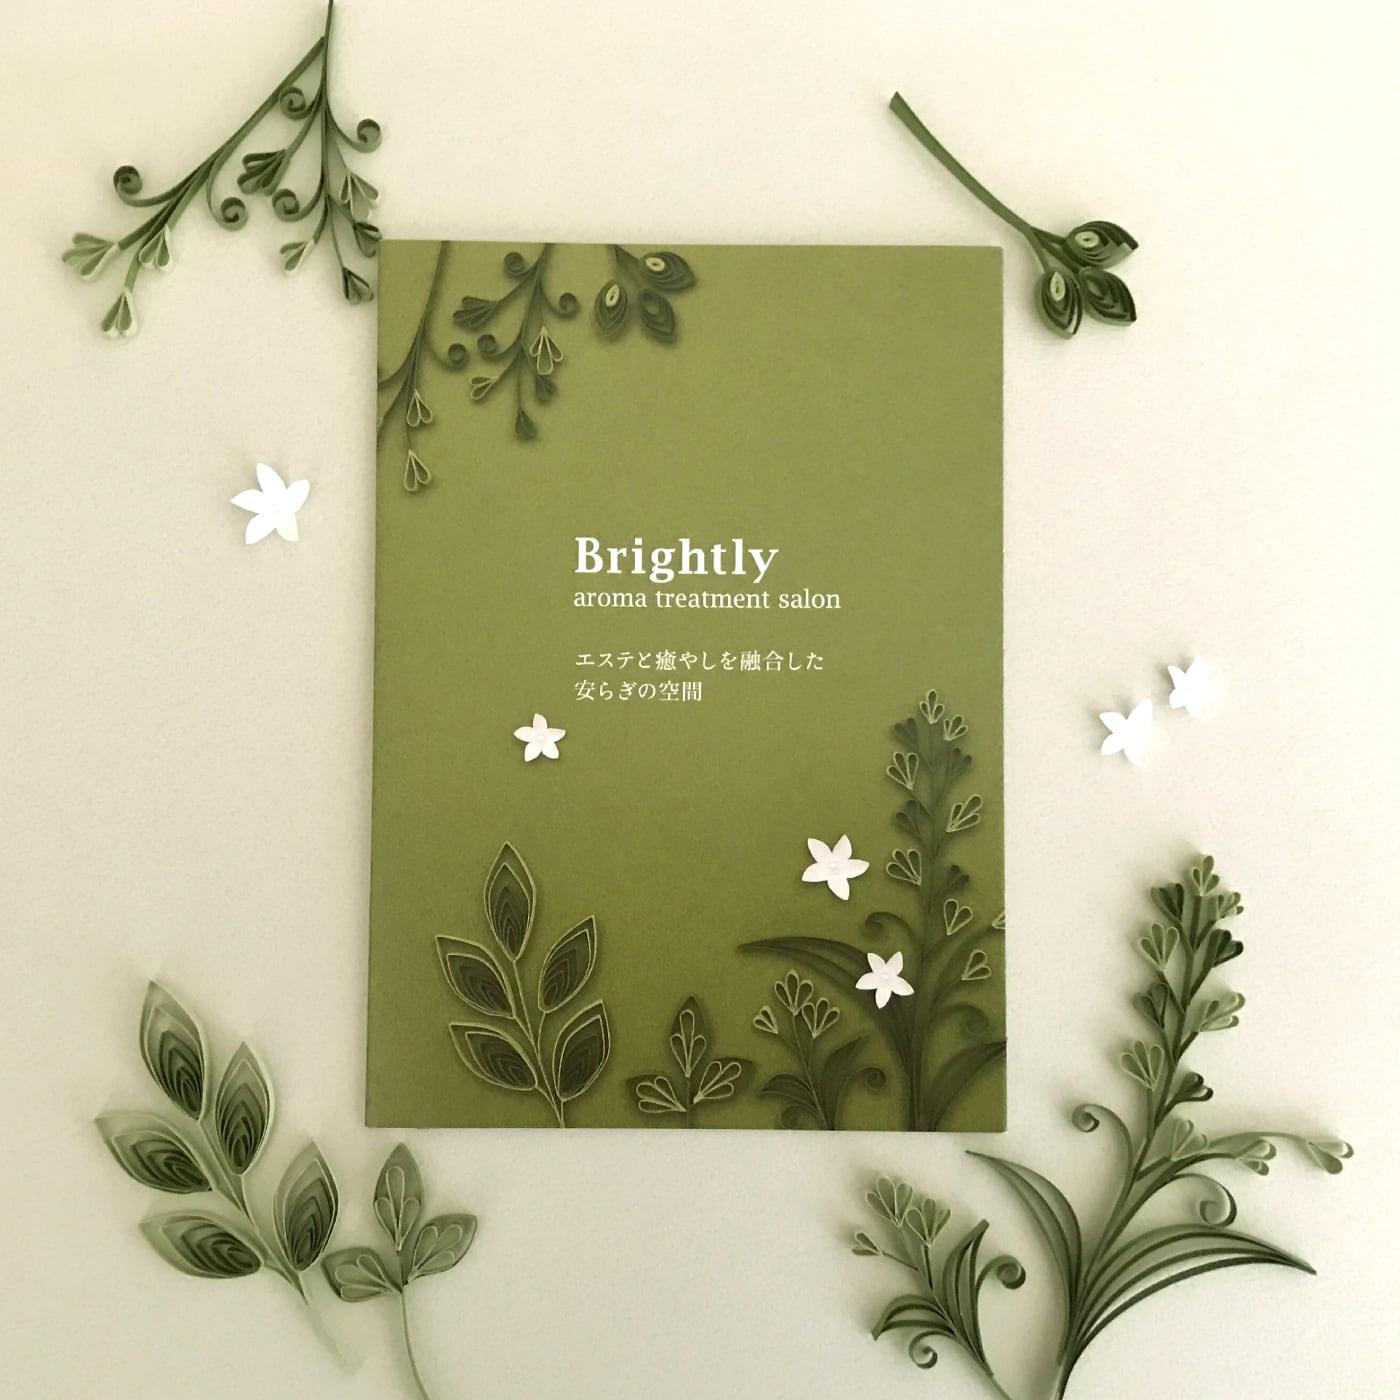 Brightlyパンフレット